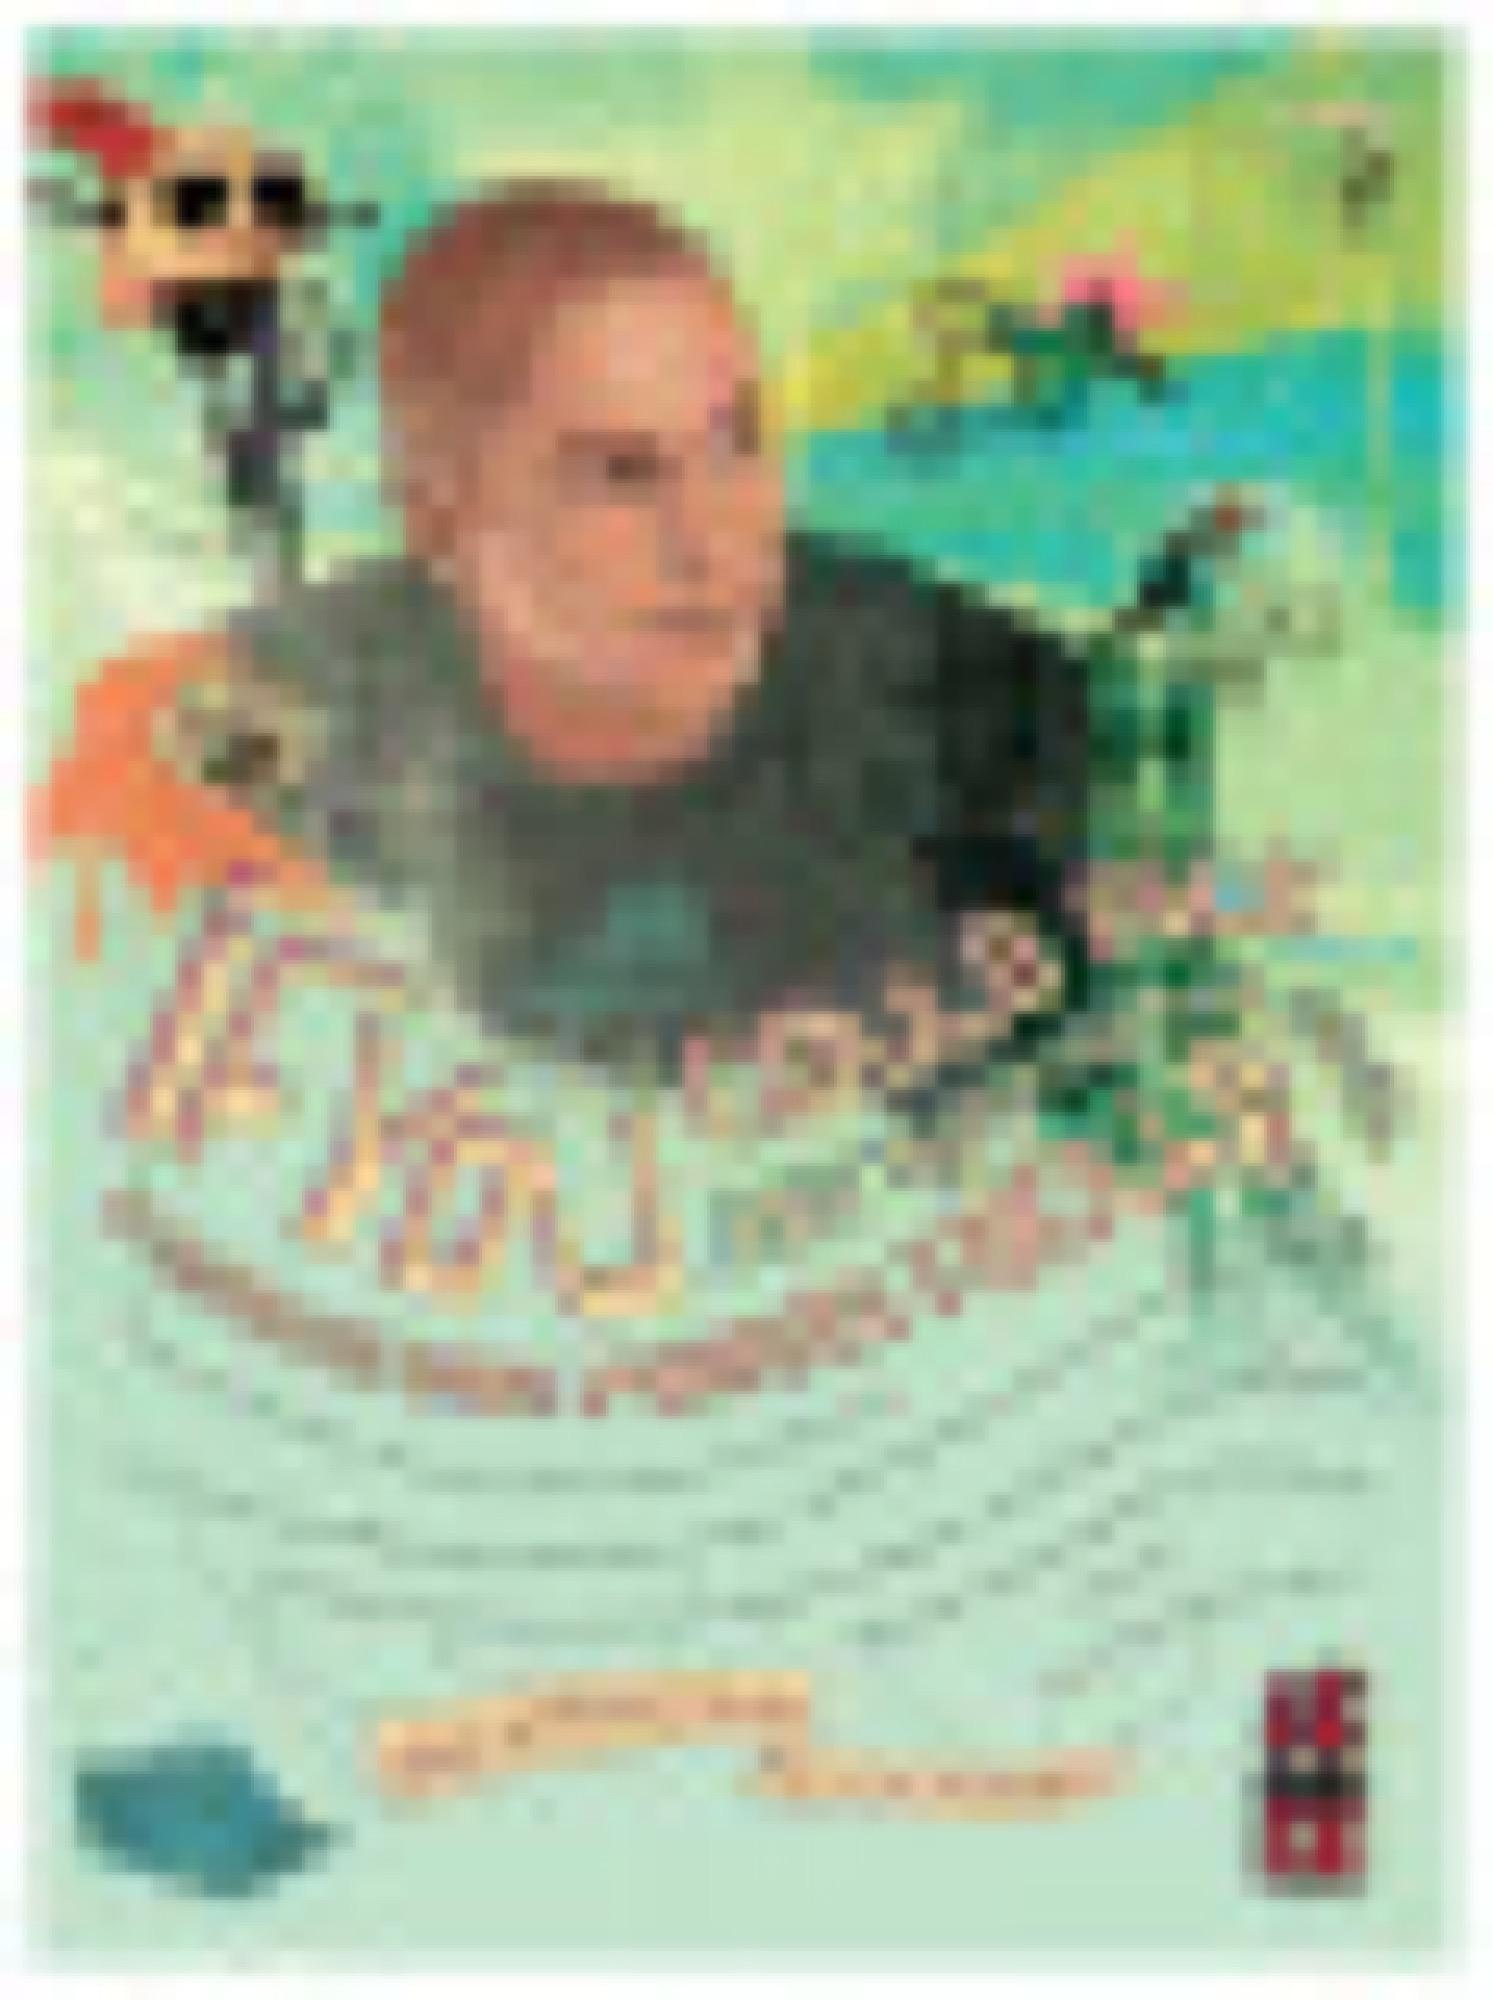 X-Games- Dave Mirra